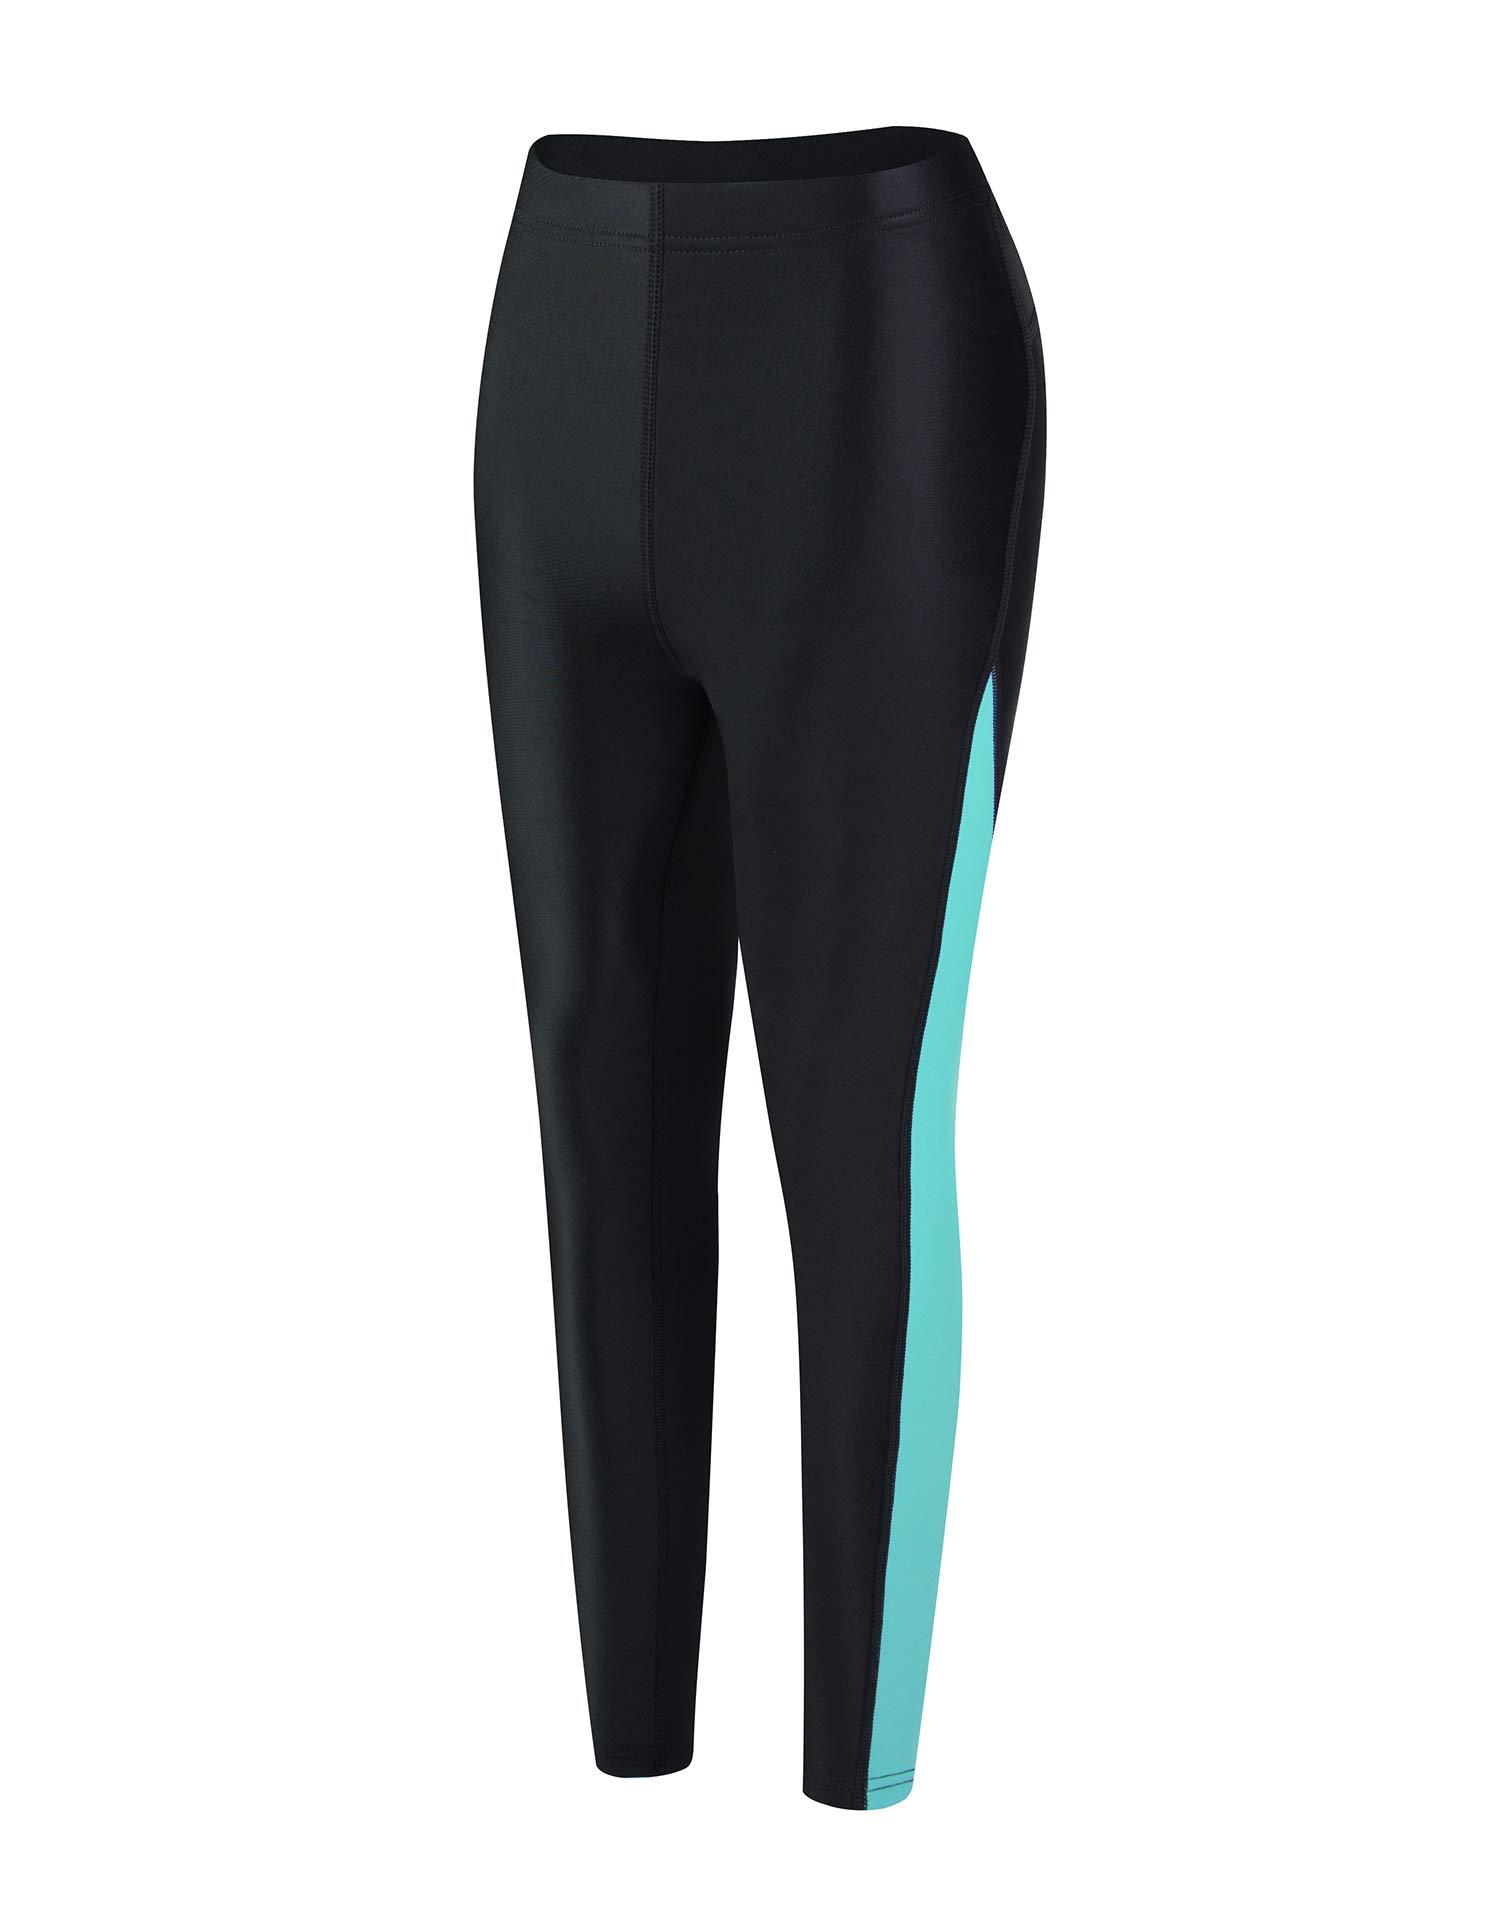 EYCE Dive & SAIL Women's 1.5mm Neoprene Wetsuit Pants Diving Snorkeling Scuba Surf Canoe Pants (Blue, Large) by EYCE